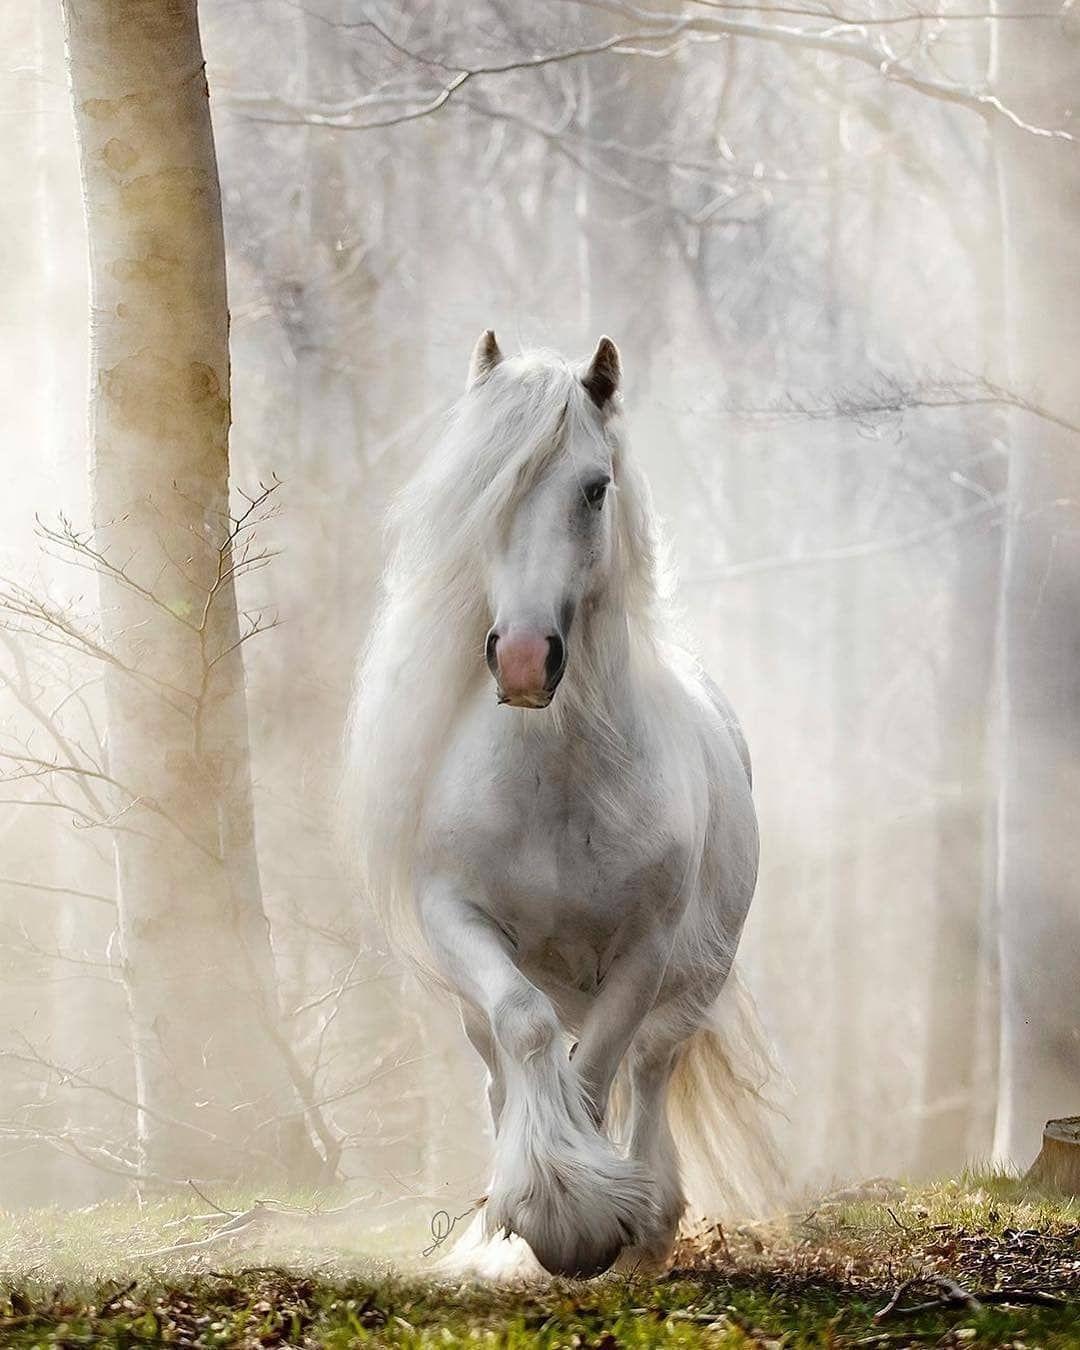 Horse Of The Instagram Auf Instagram Faszinierende Schonheit Aus Katarzyna Photo Equ In 2020 Grosse Pferde Pferde Wallpaper Pferde